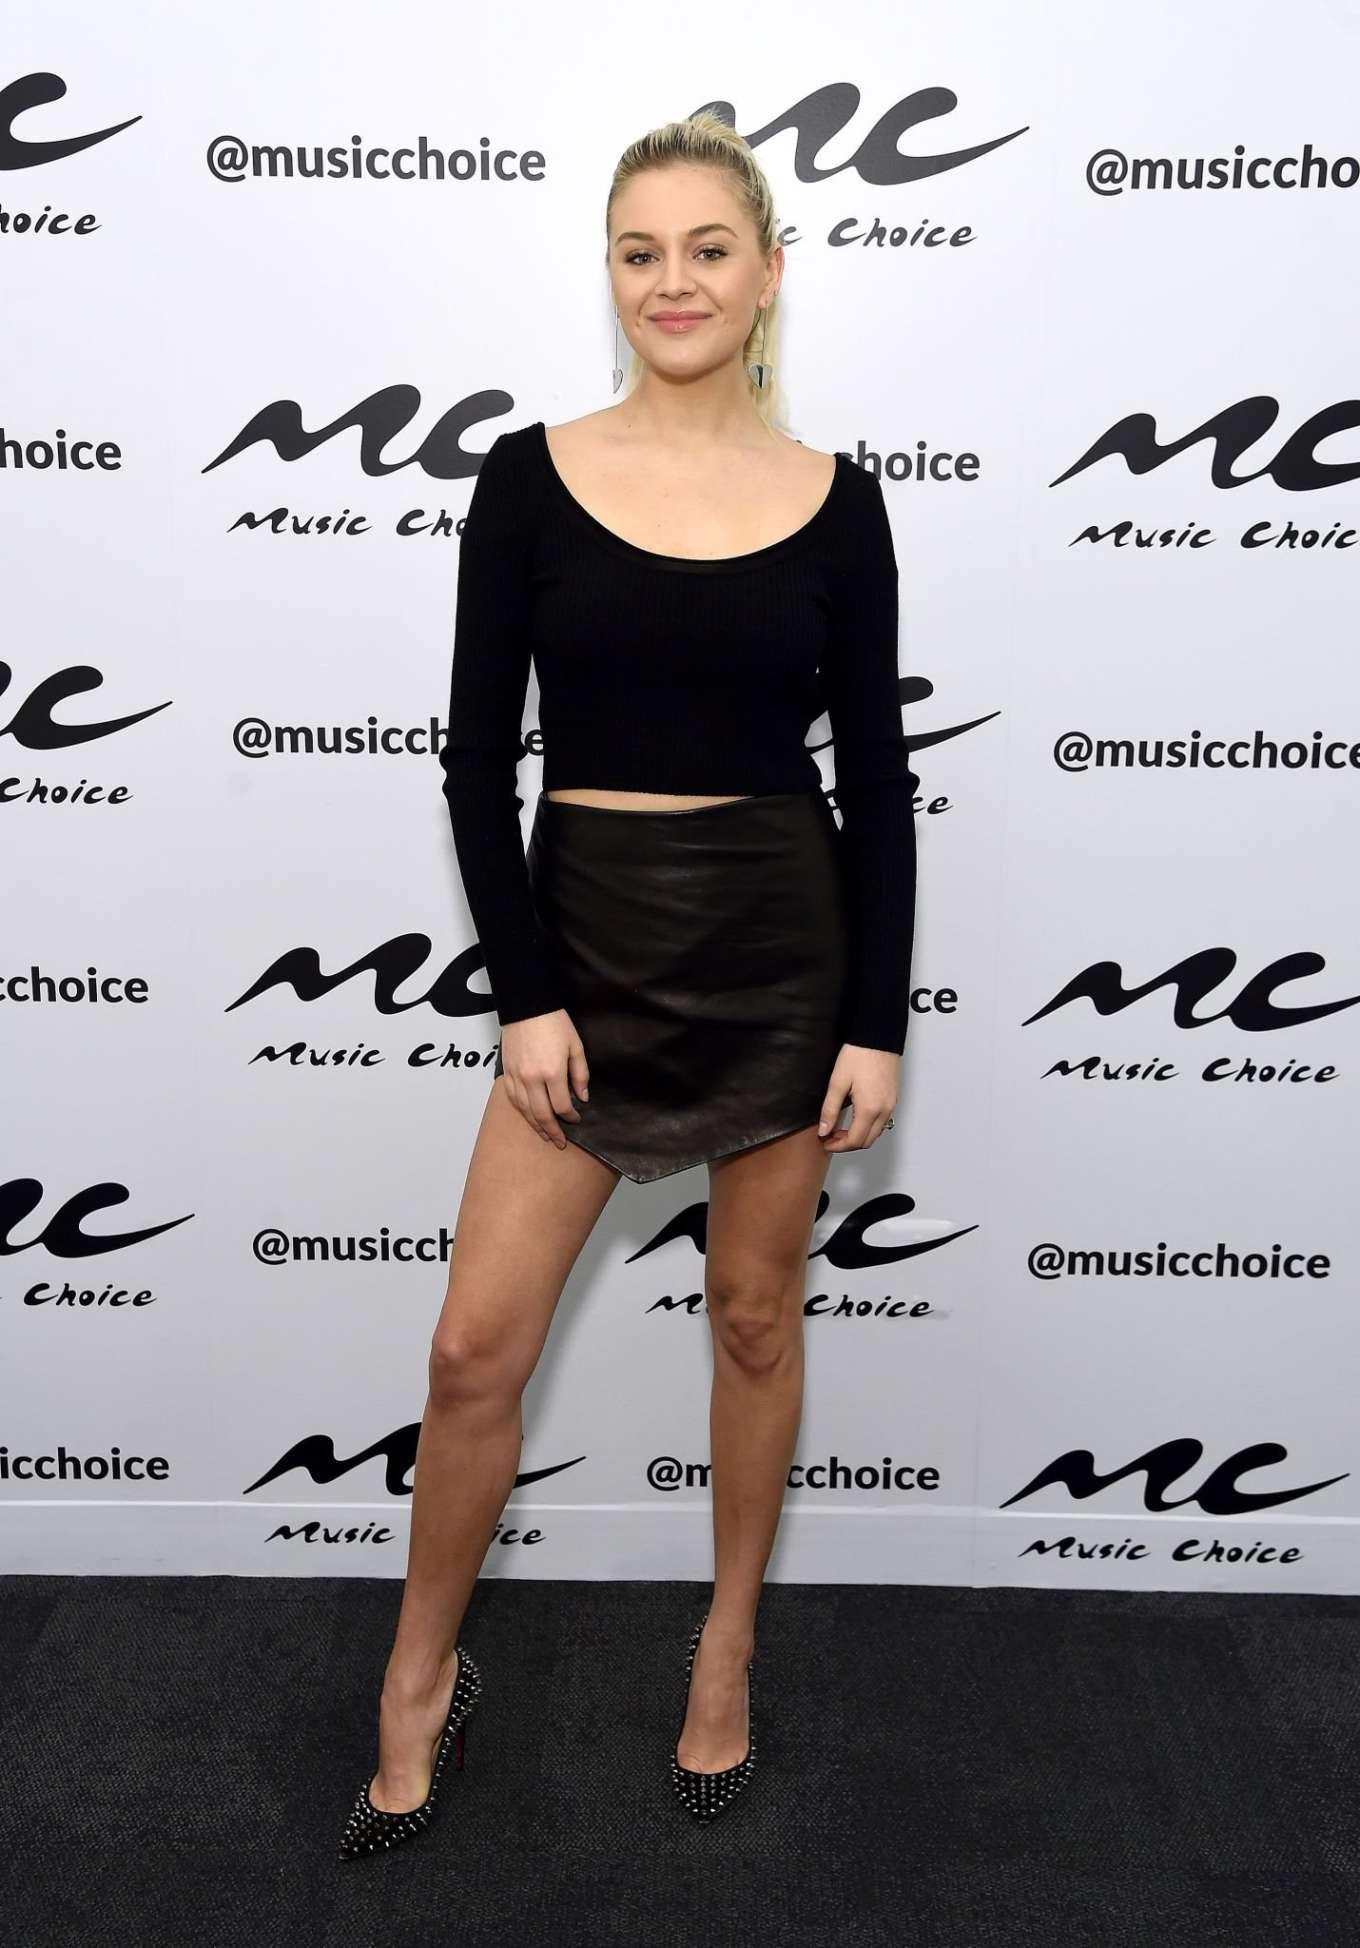 Kelsea Ballerini 2020 : Kelsea Ballerini visiting Music Choice in NYC-02